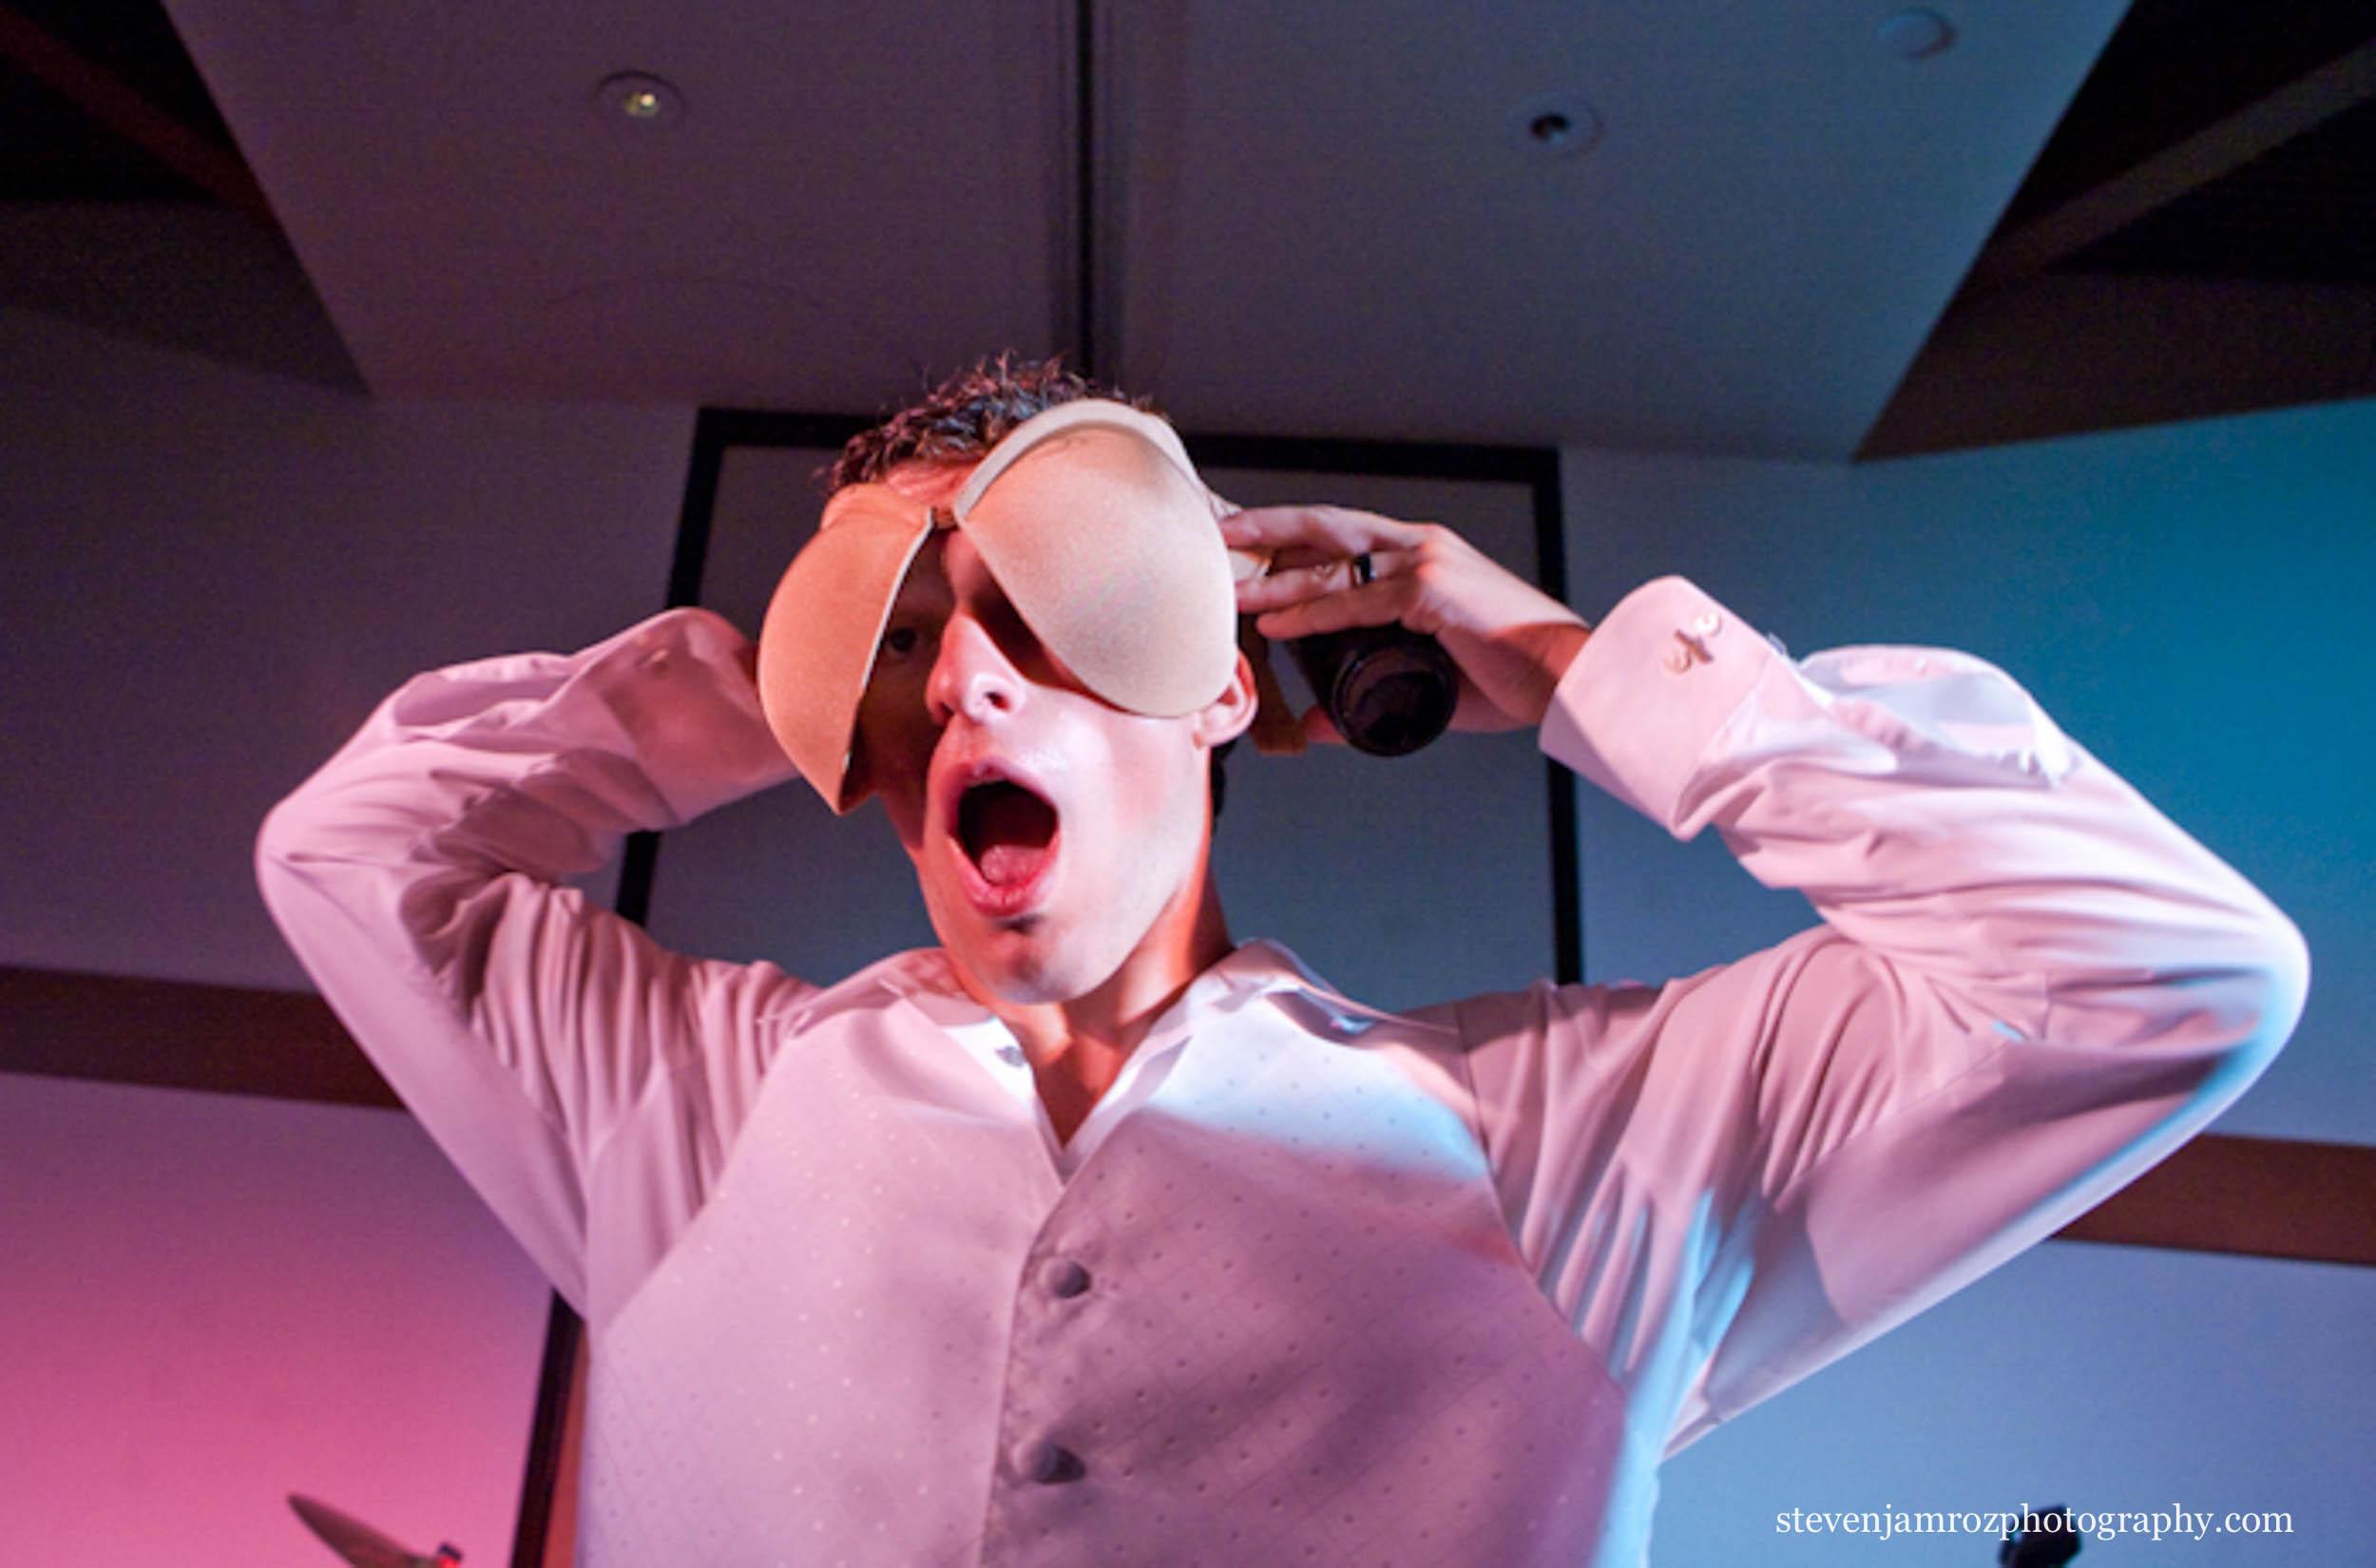 bra-off-wedding-reception-raleigh-steven-jamroz-photography-0343.jpg